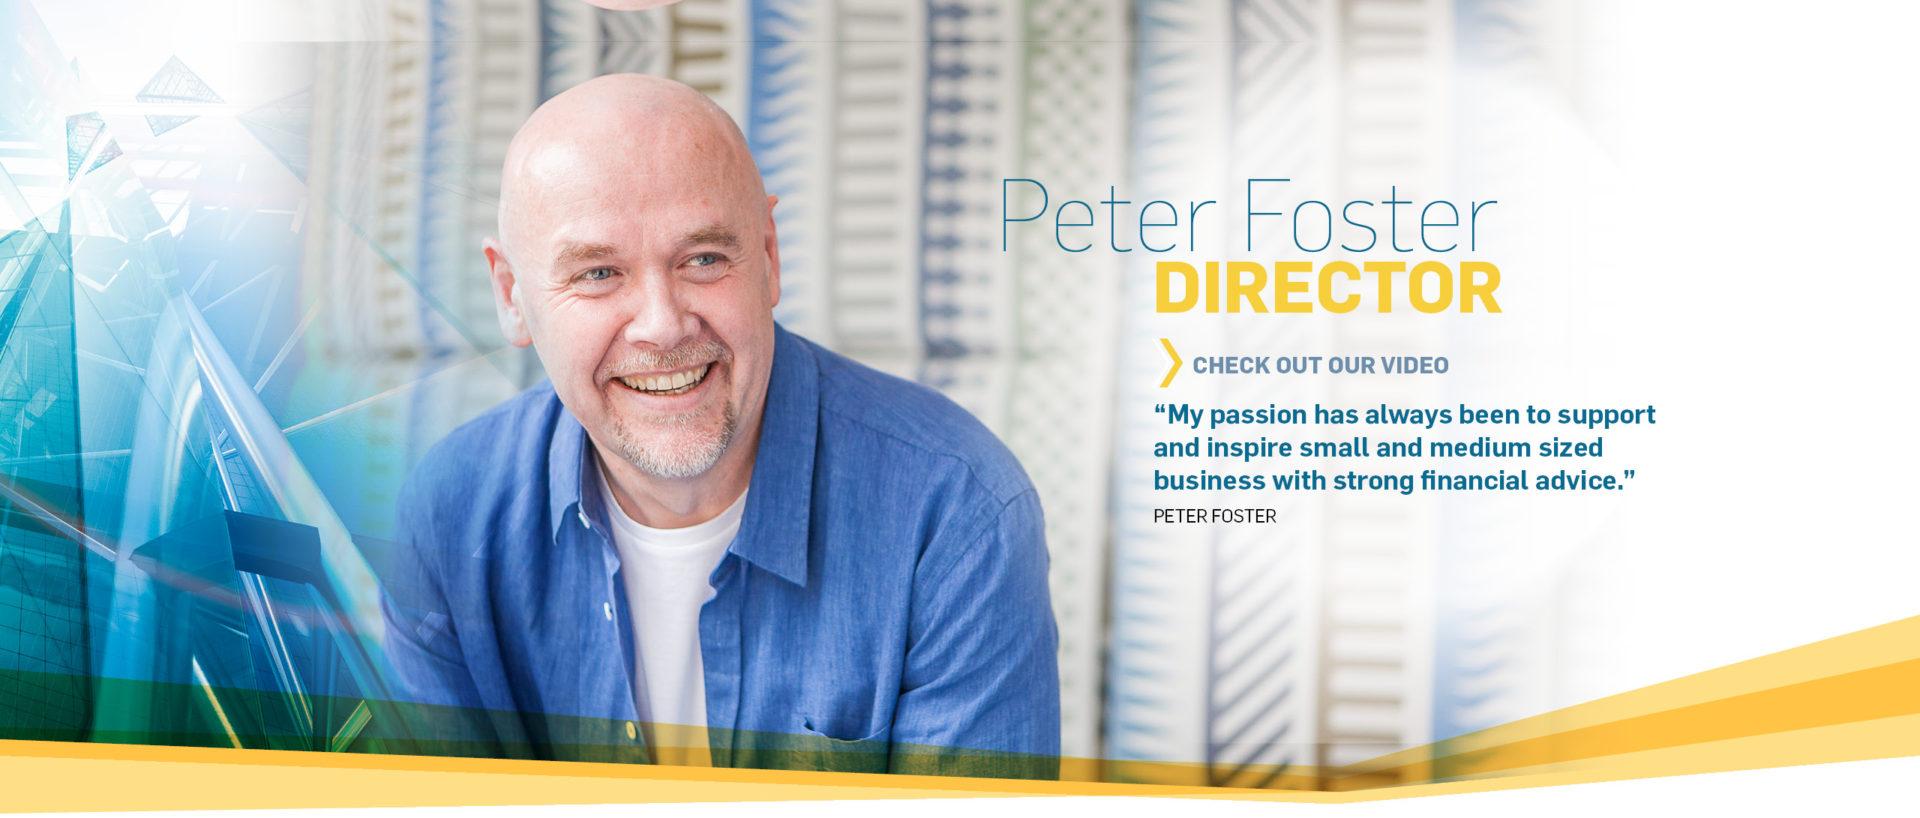 Peter Foster Director